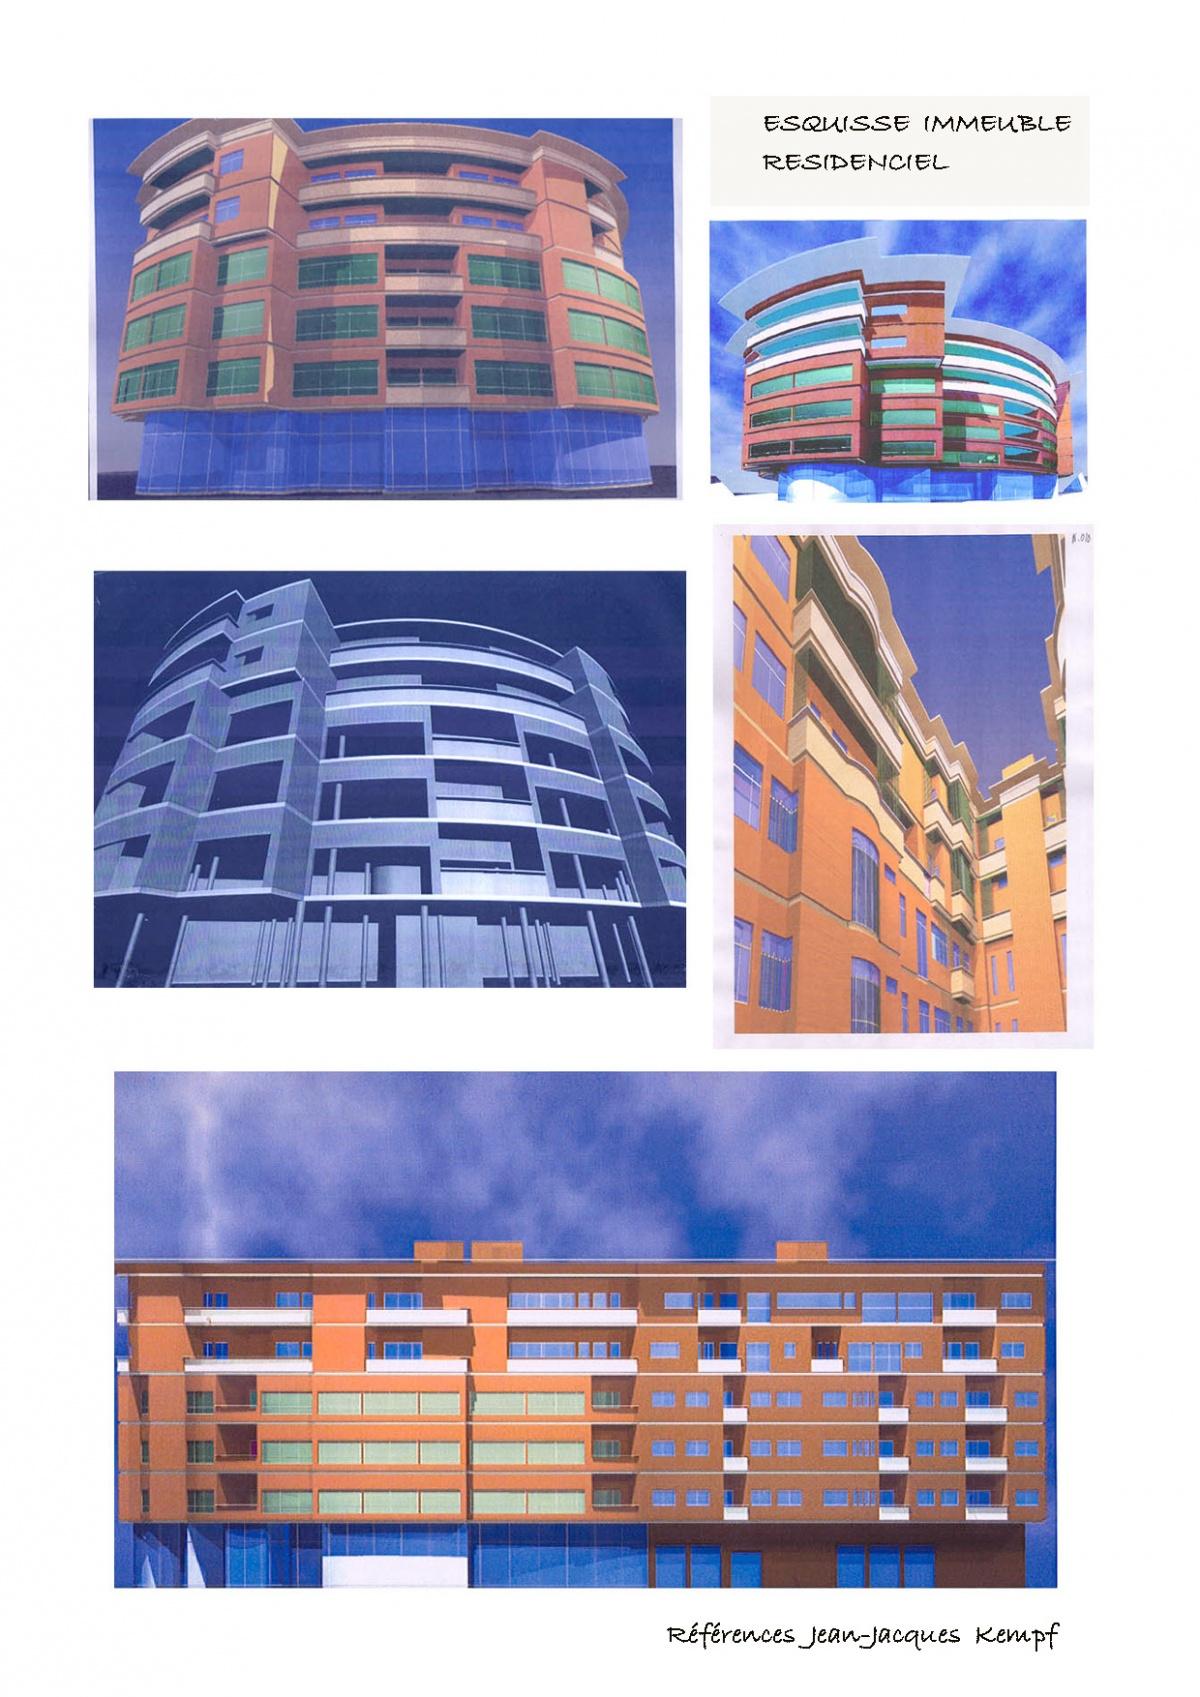 Marina D'Azilah au Maroc : 02-Immeuble Esquisse.MK